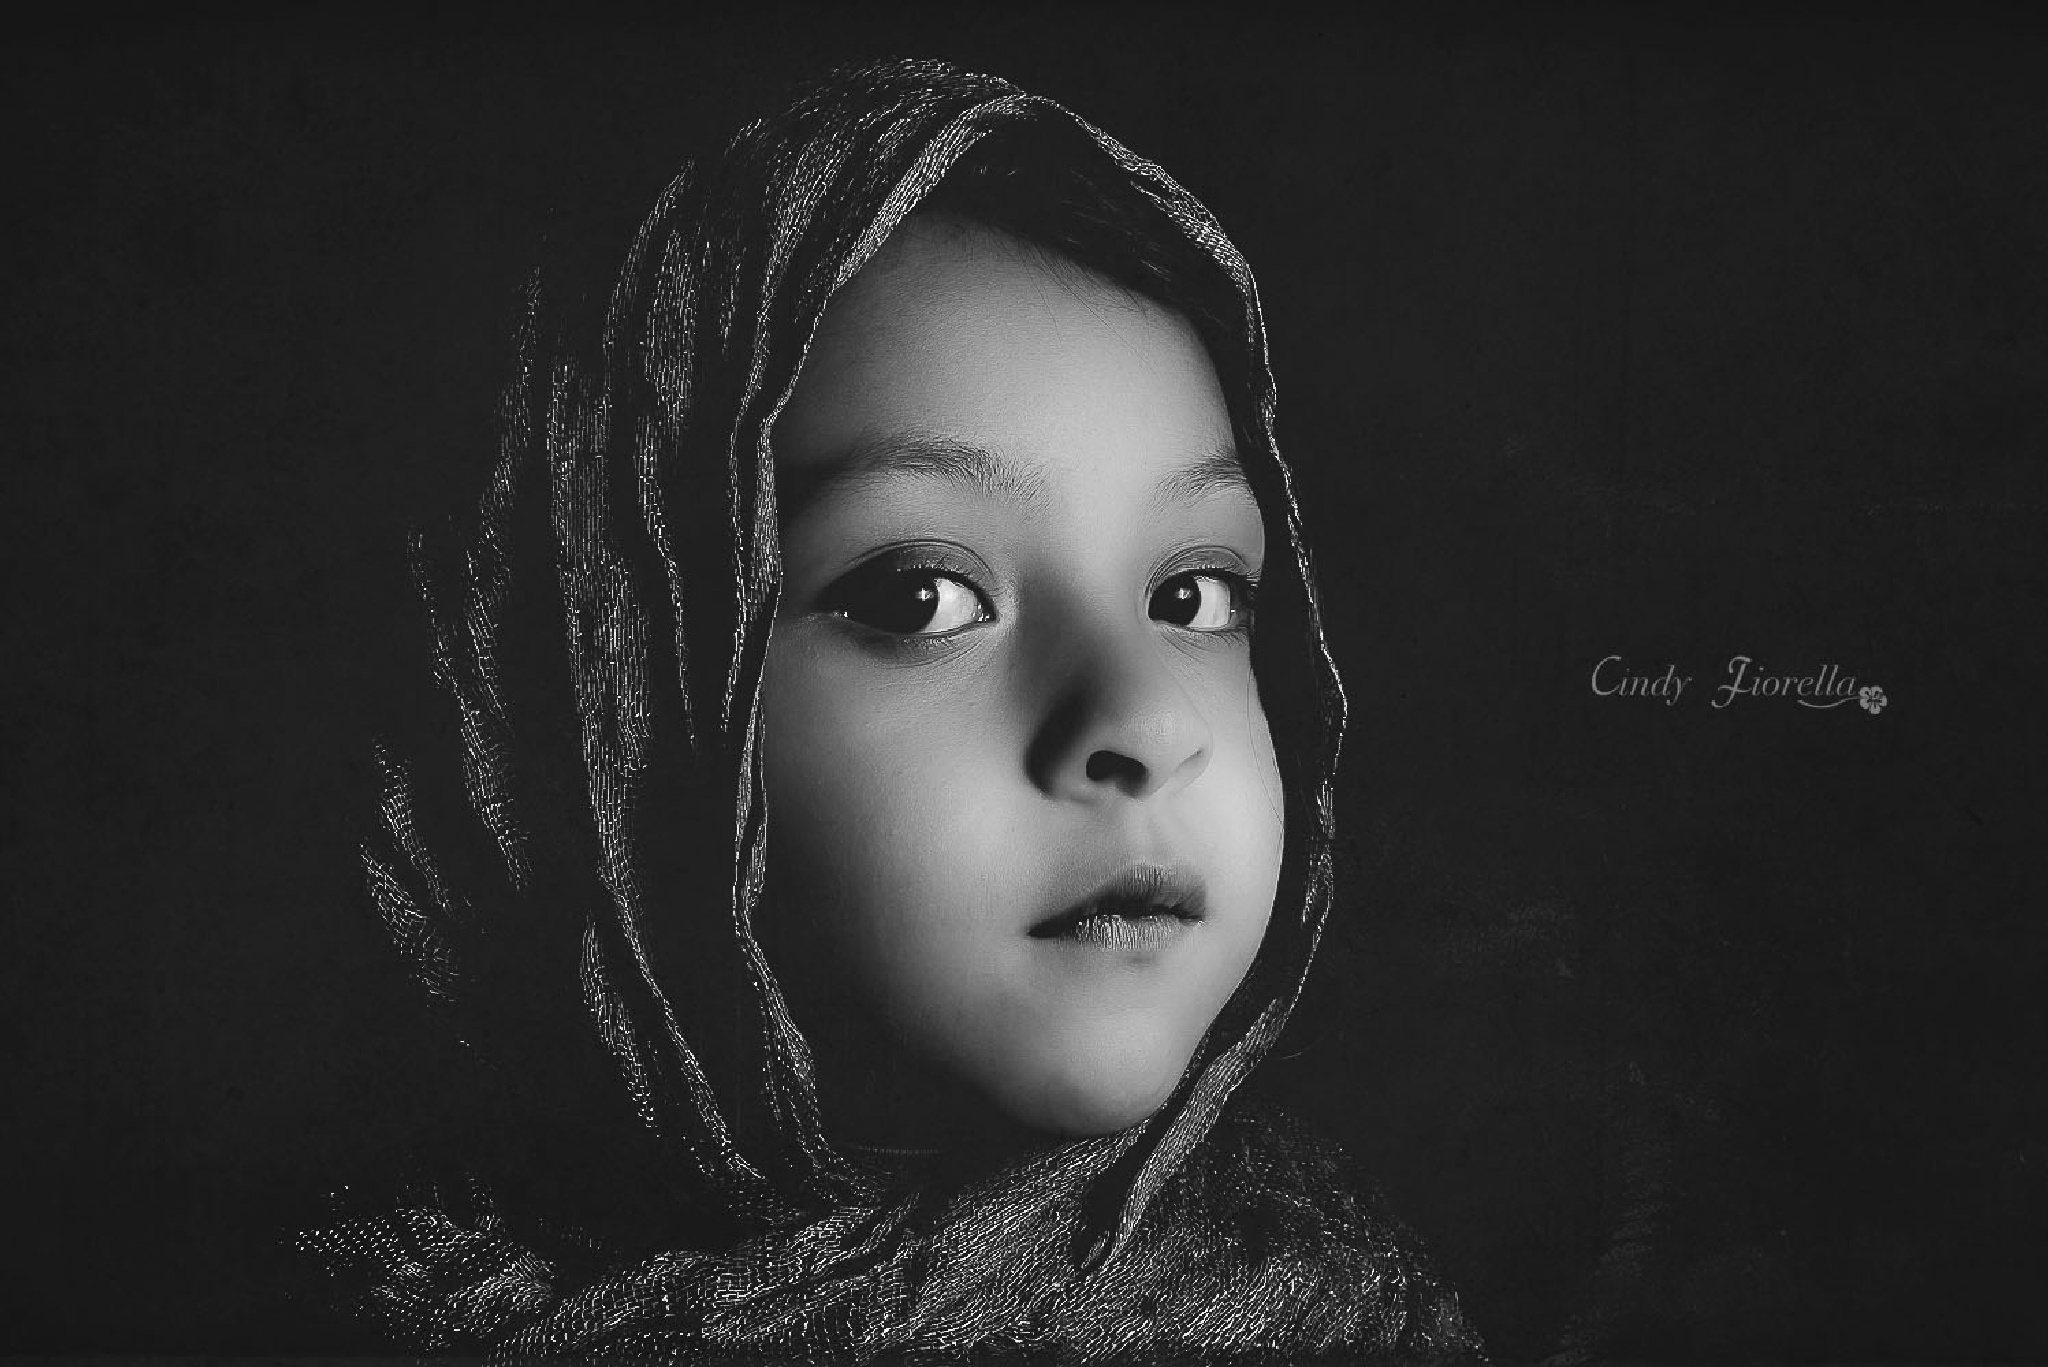 She by Cindy Soto Aranguena